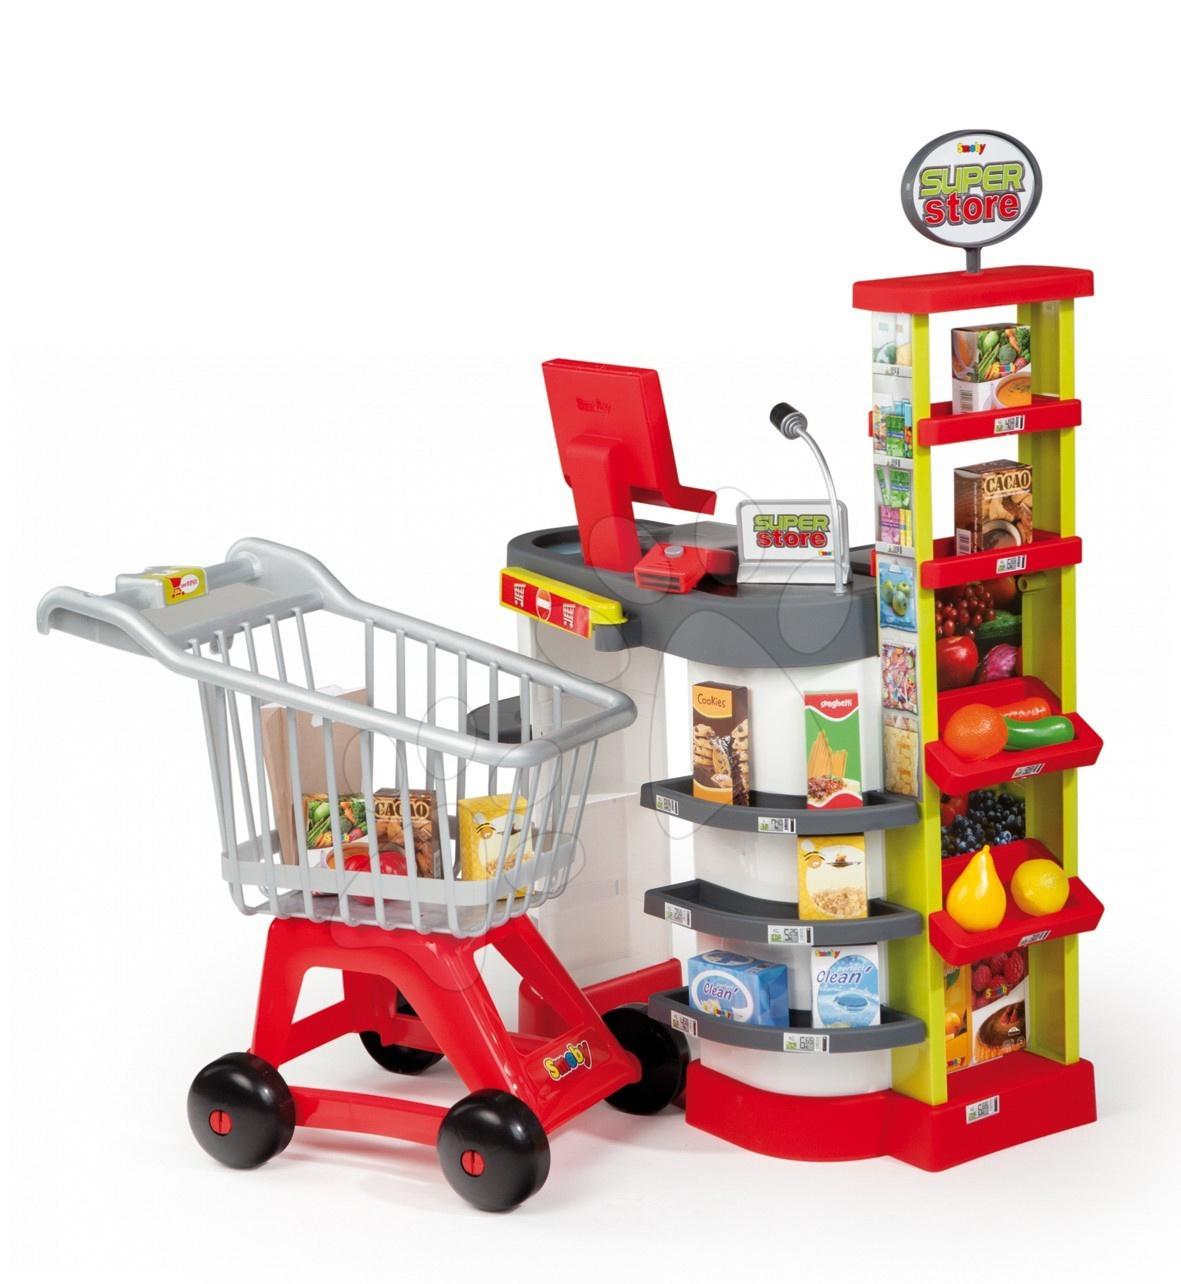 Super Store obchod s červeným vozíkem Smoby elektrický s doplňky